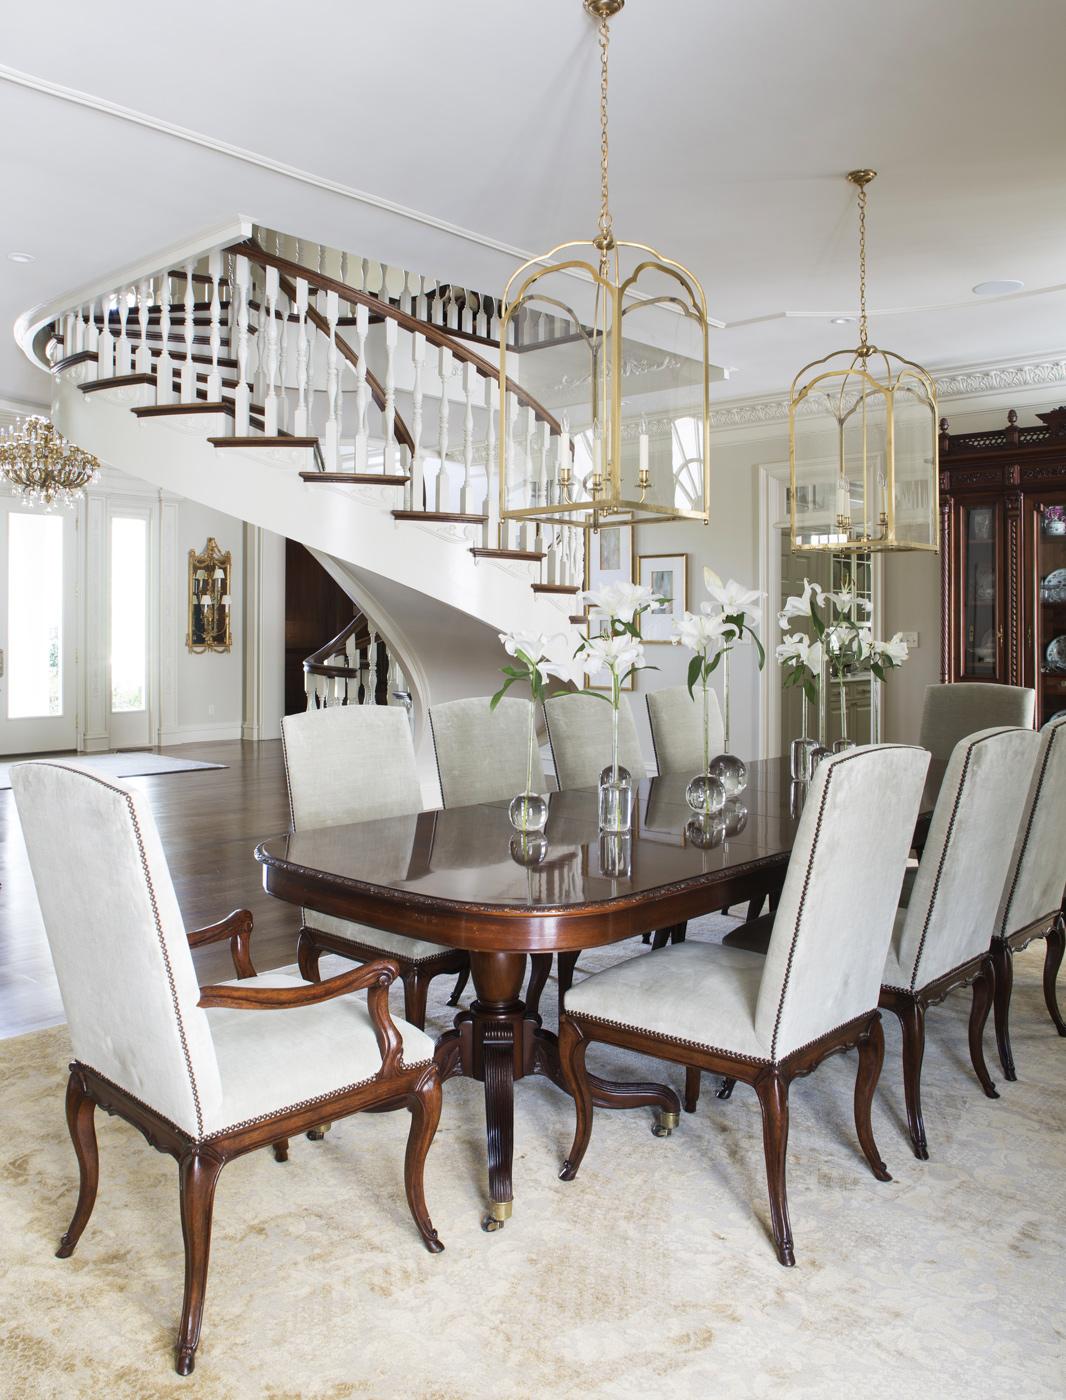 Cindy-McCord-Interior-Design-Collierville-House-012.jpg